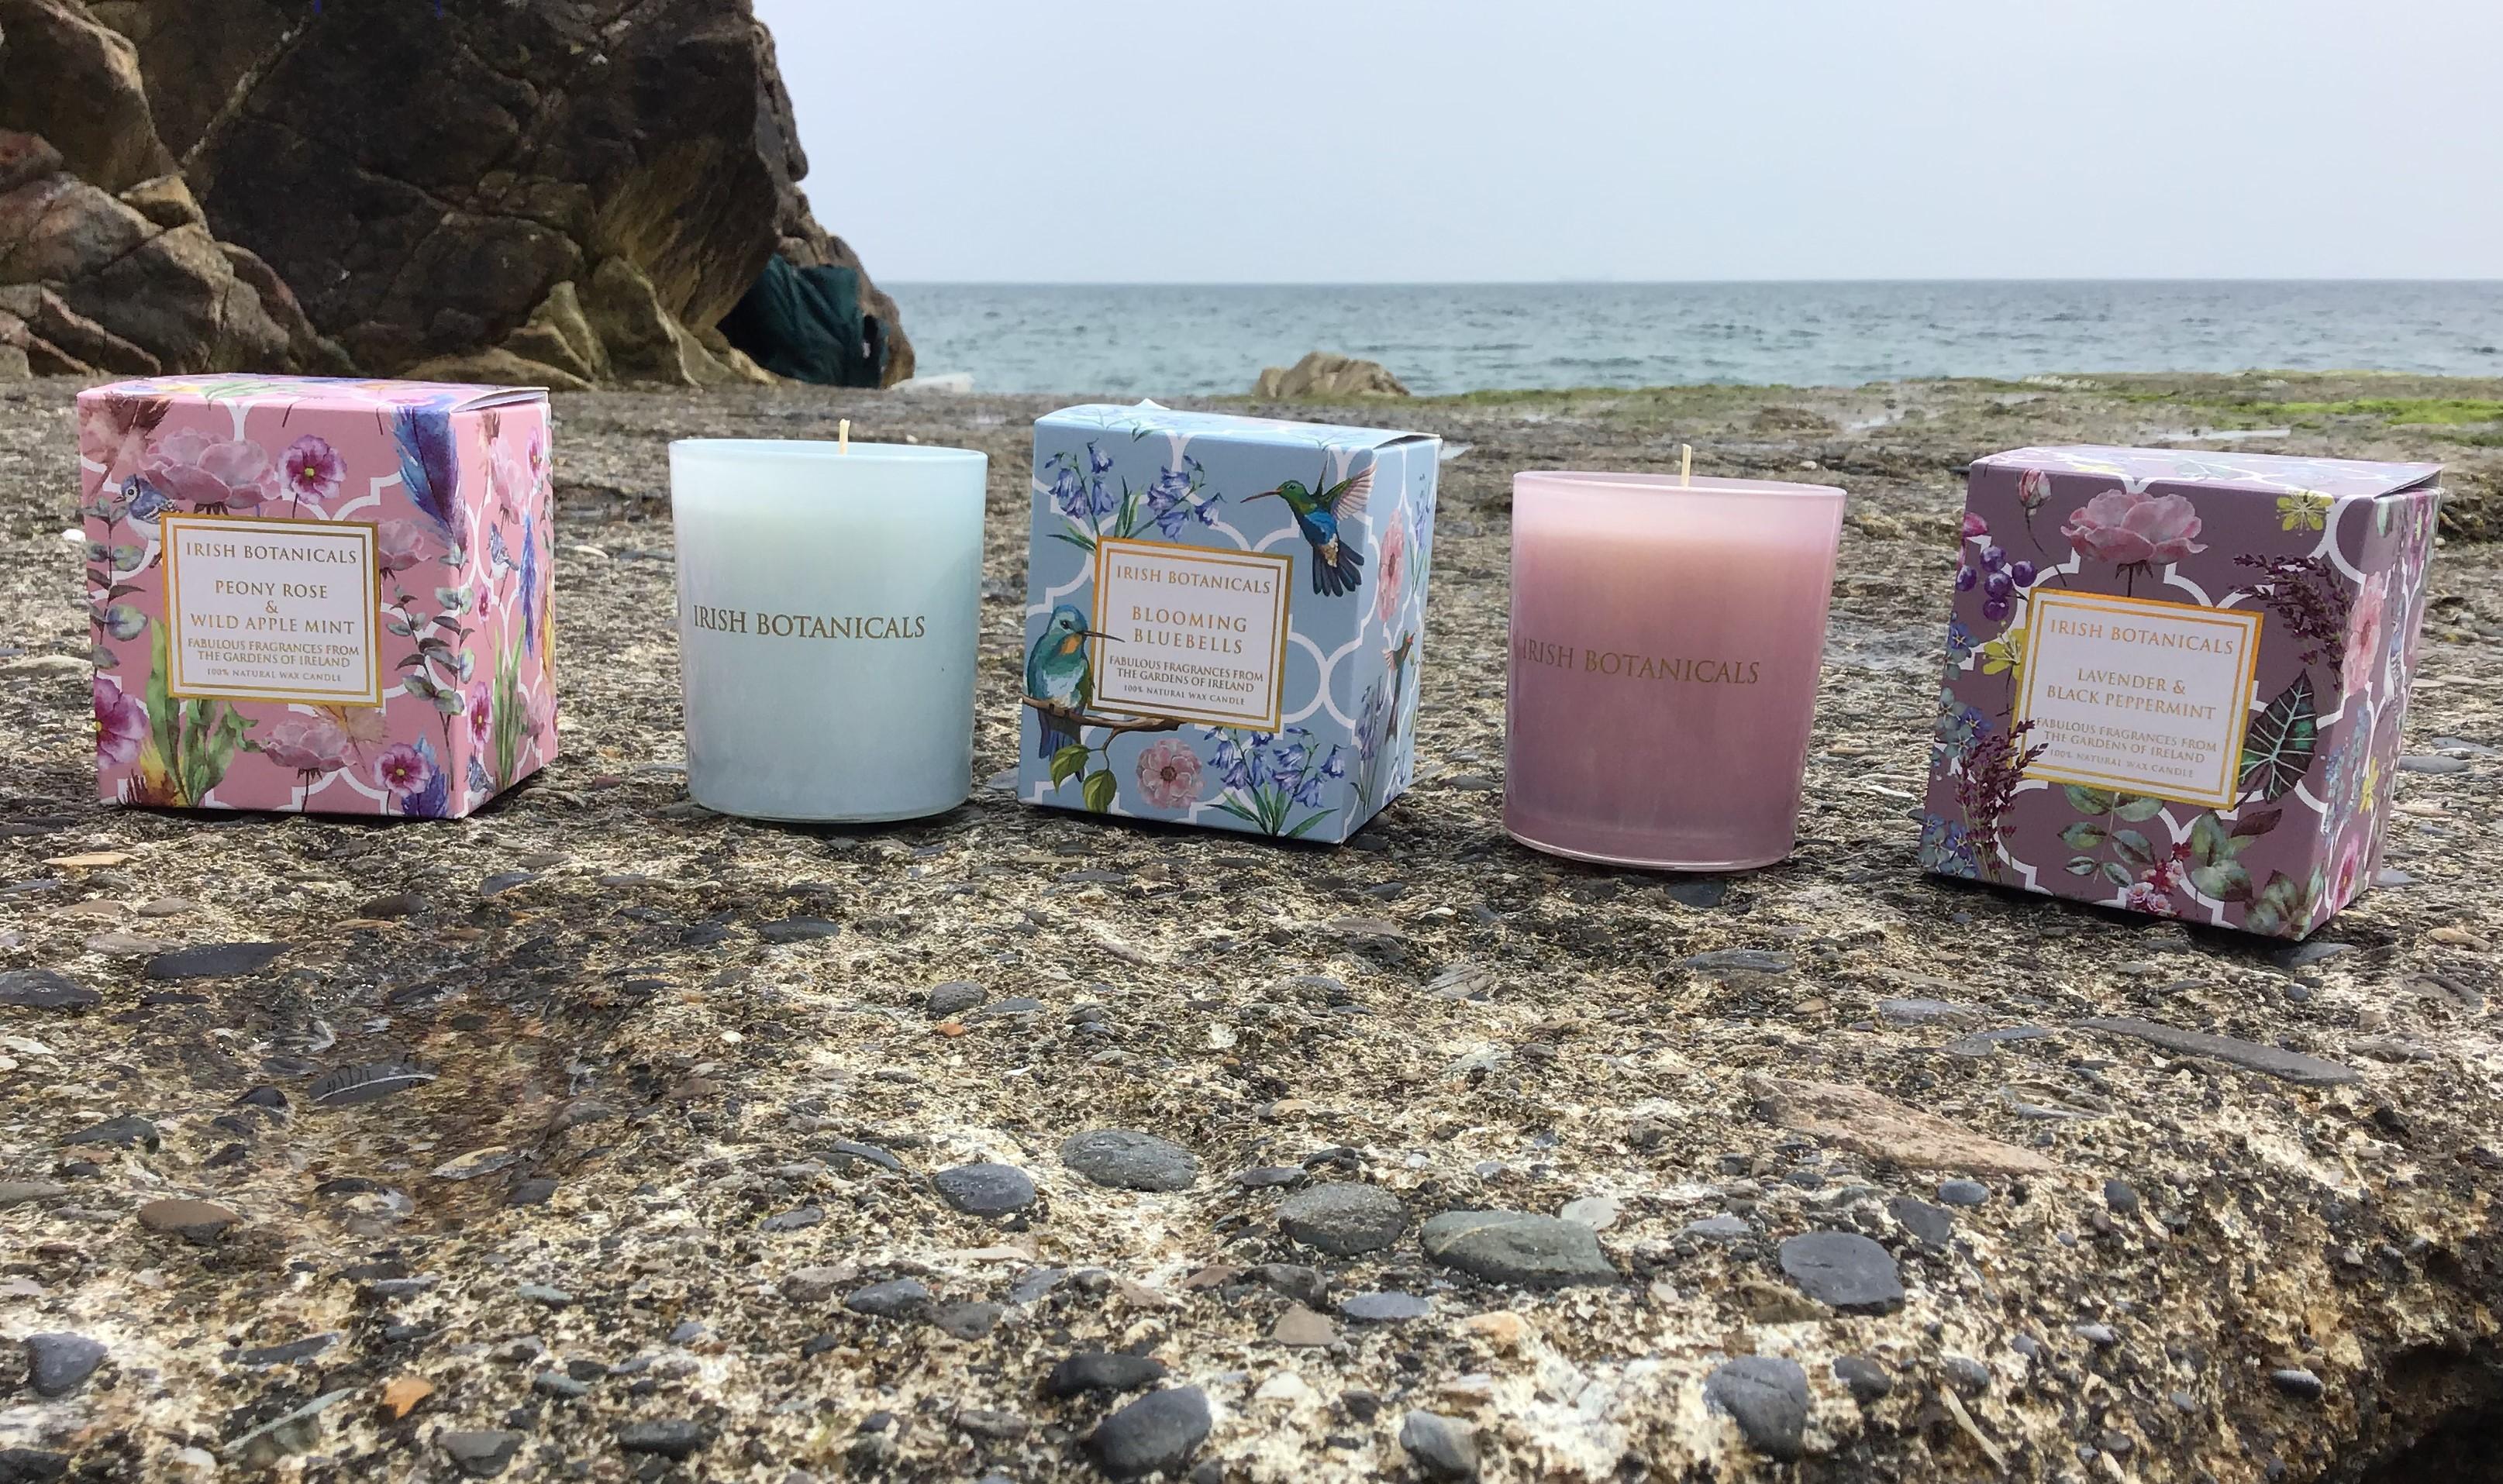 3 Irish Botanicals candle jars on the beach